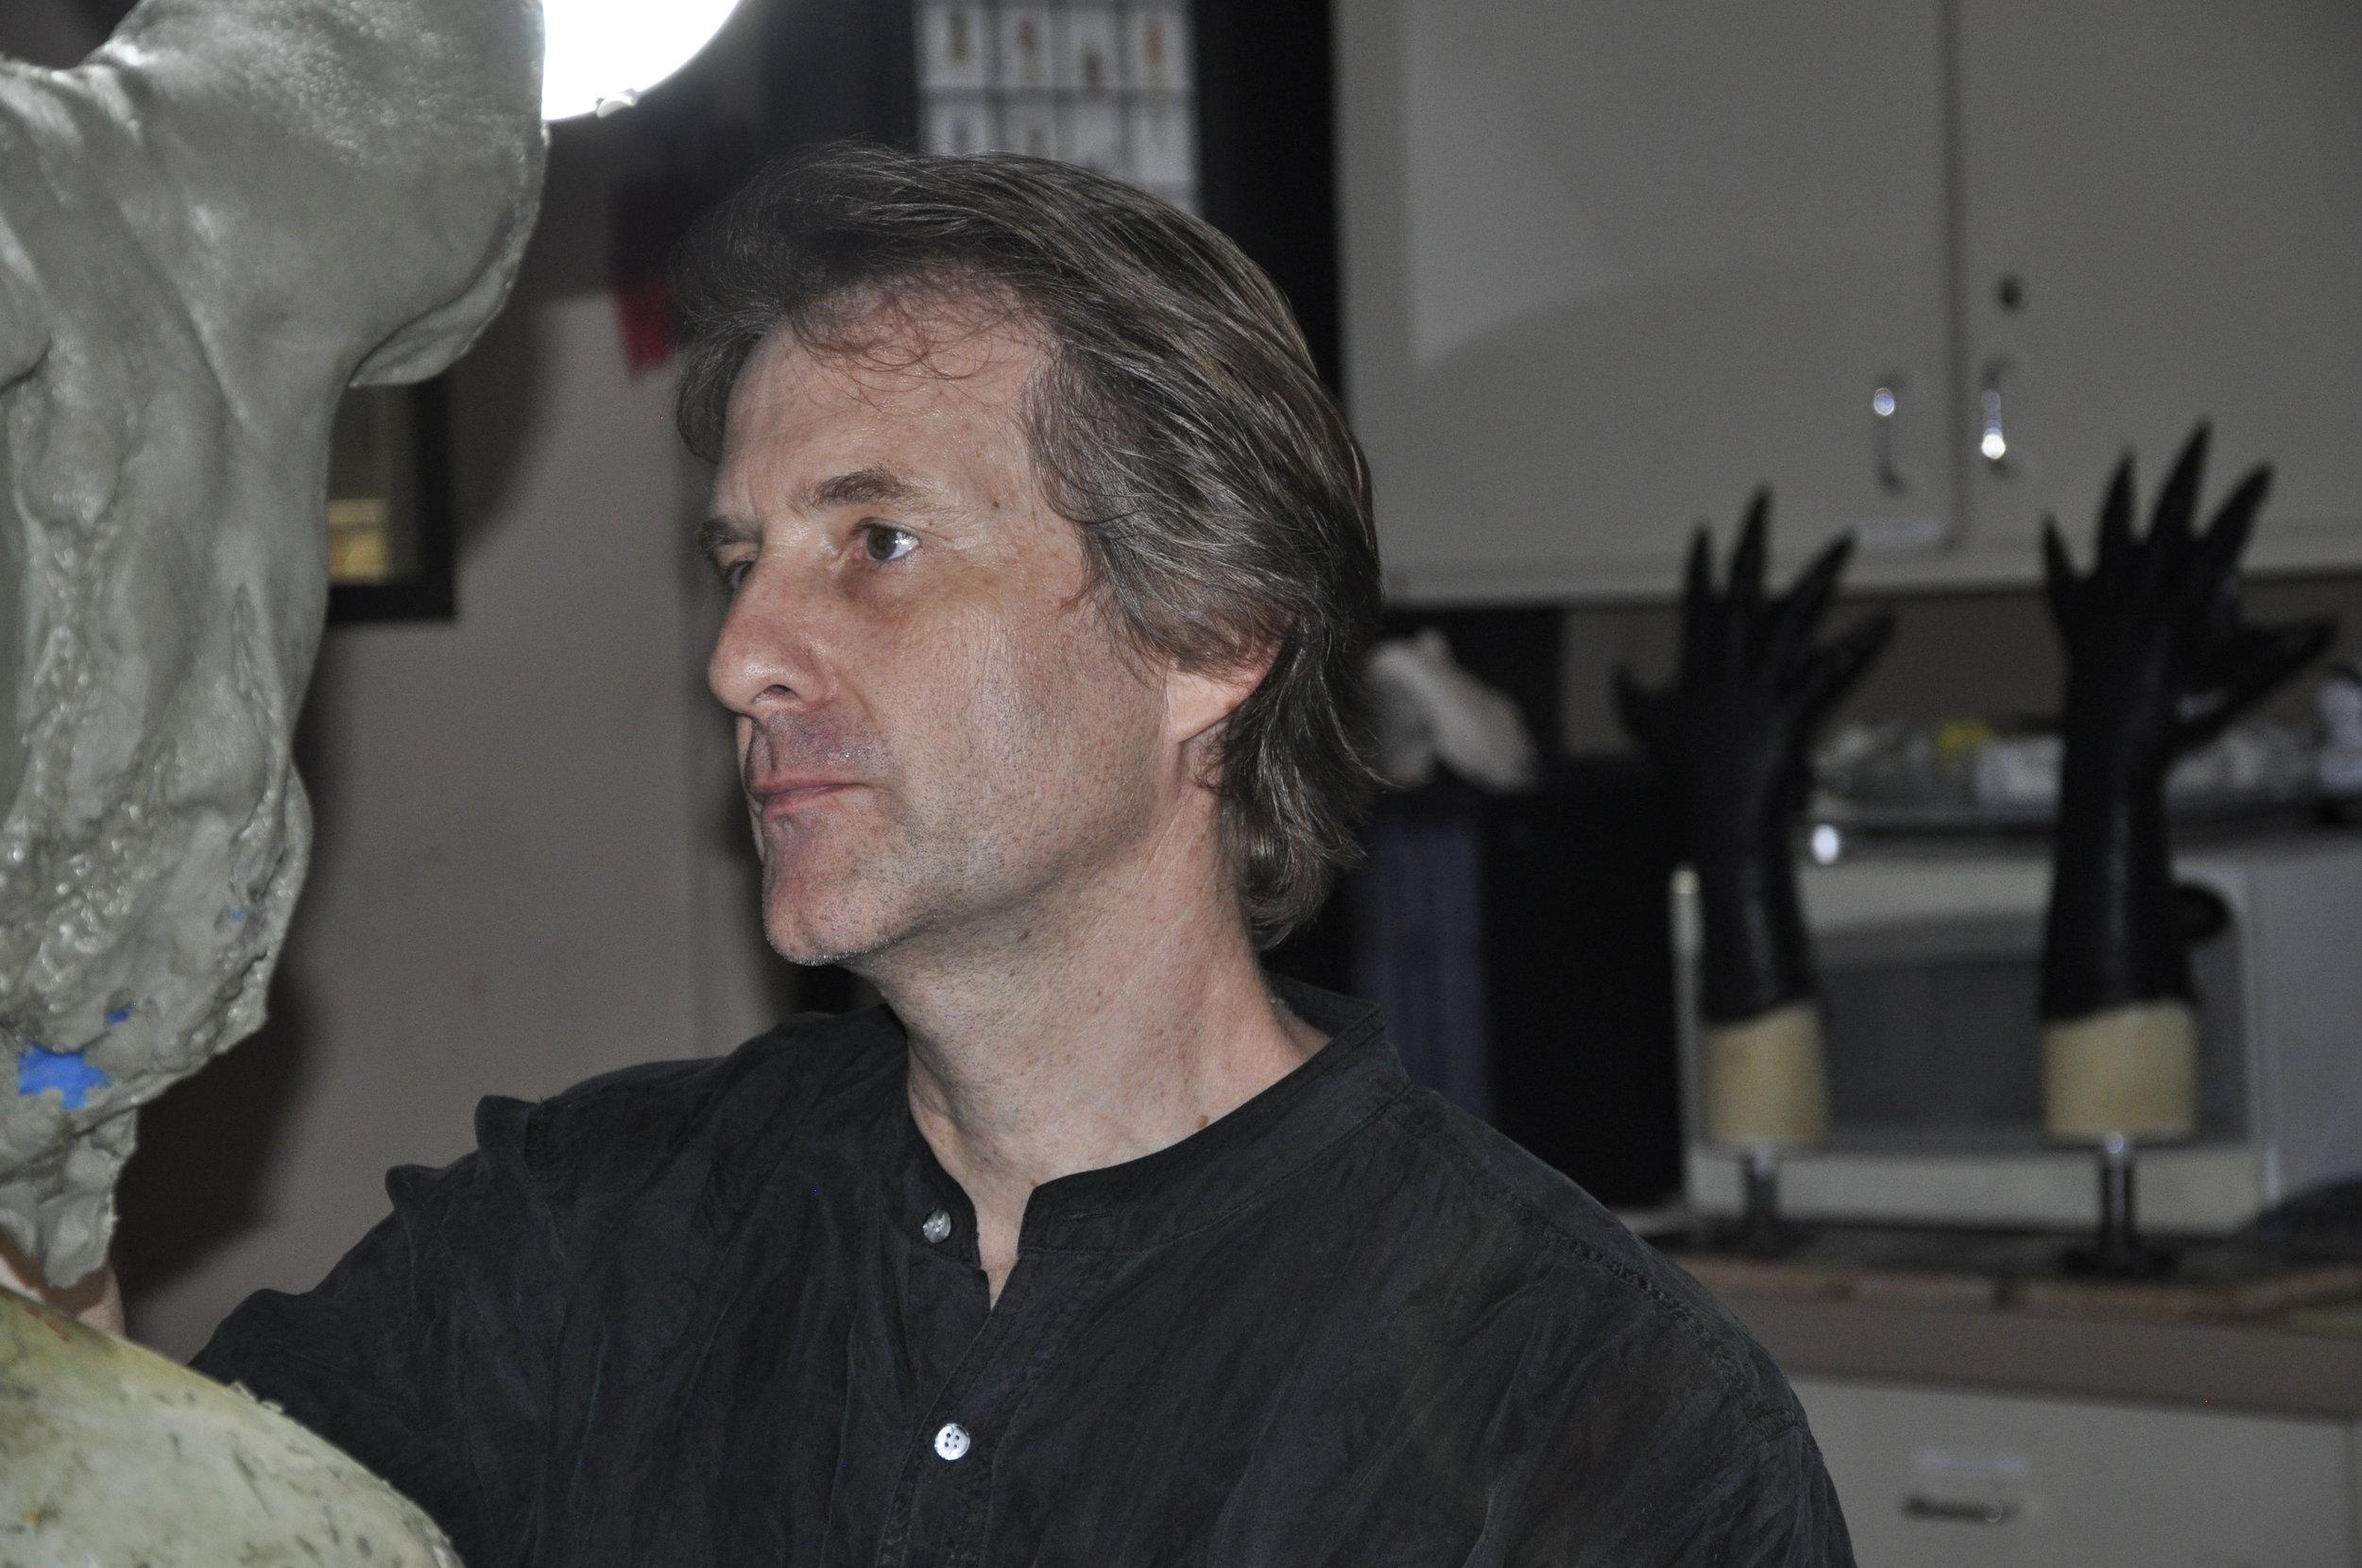 Glen eisner sculpting